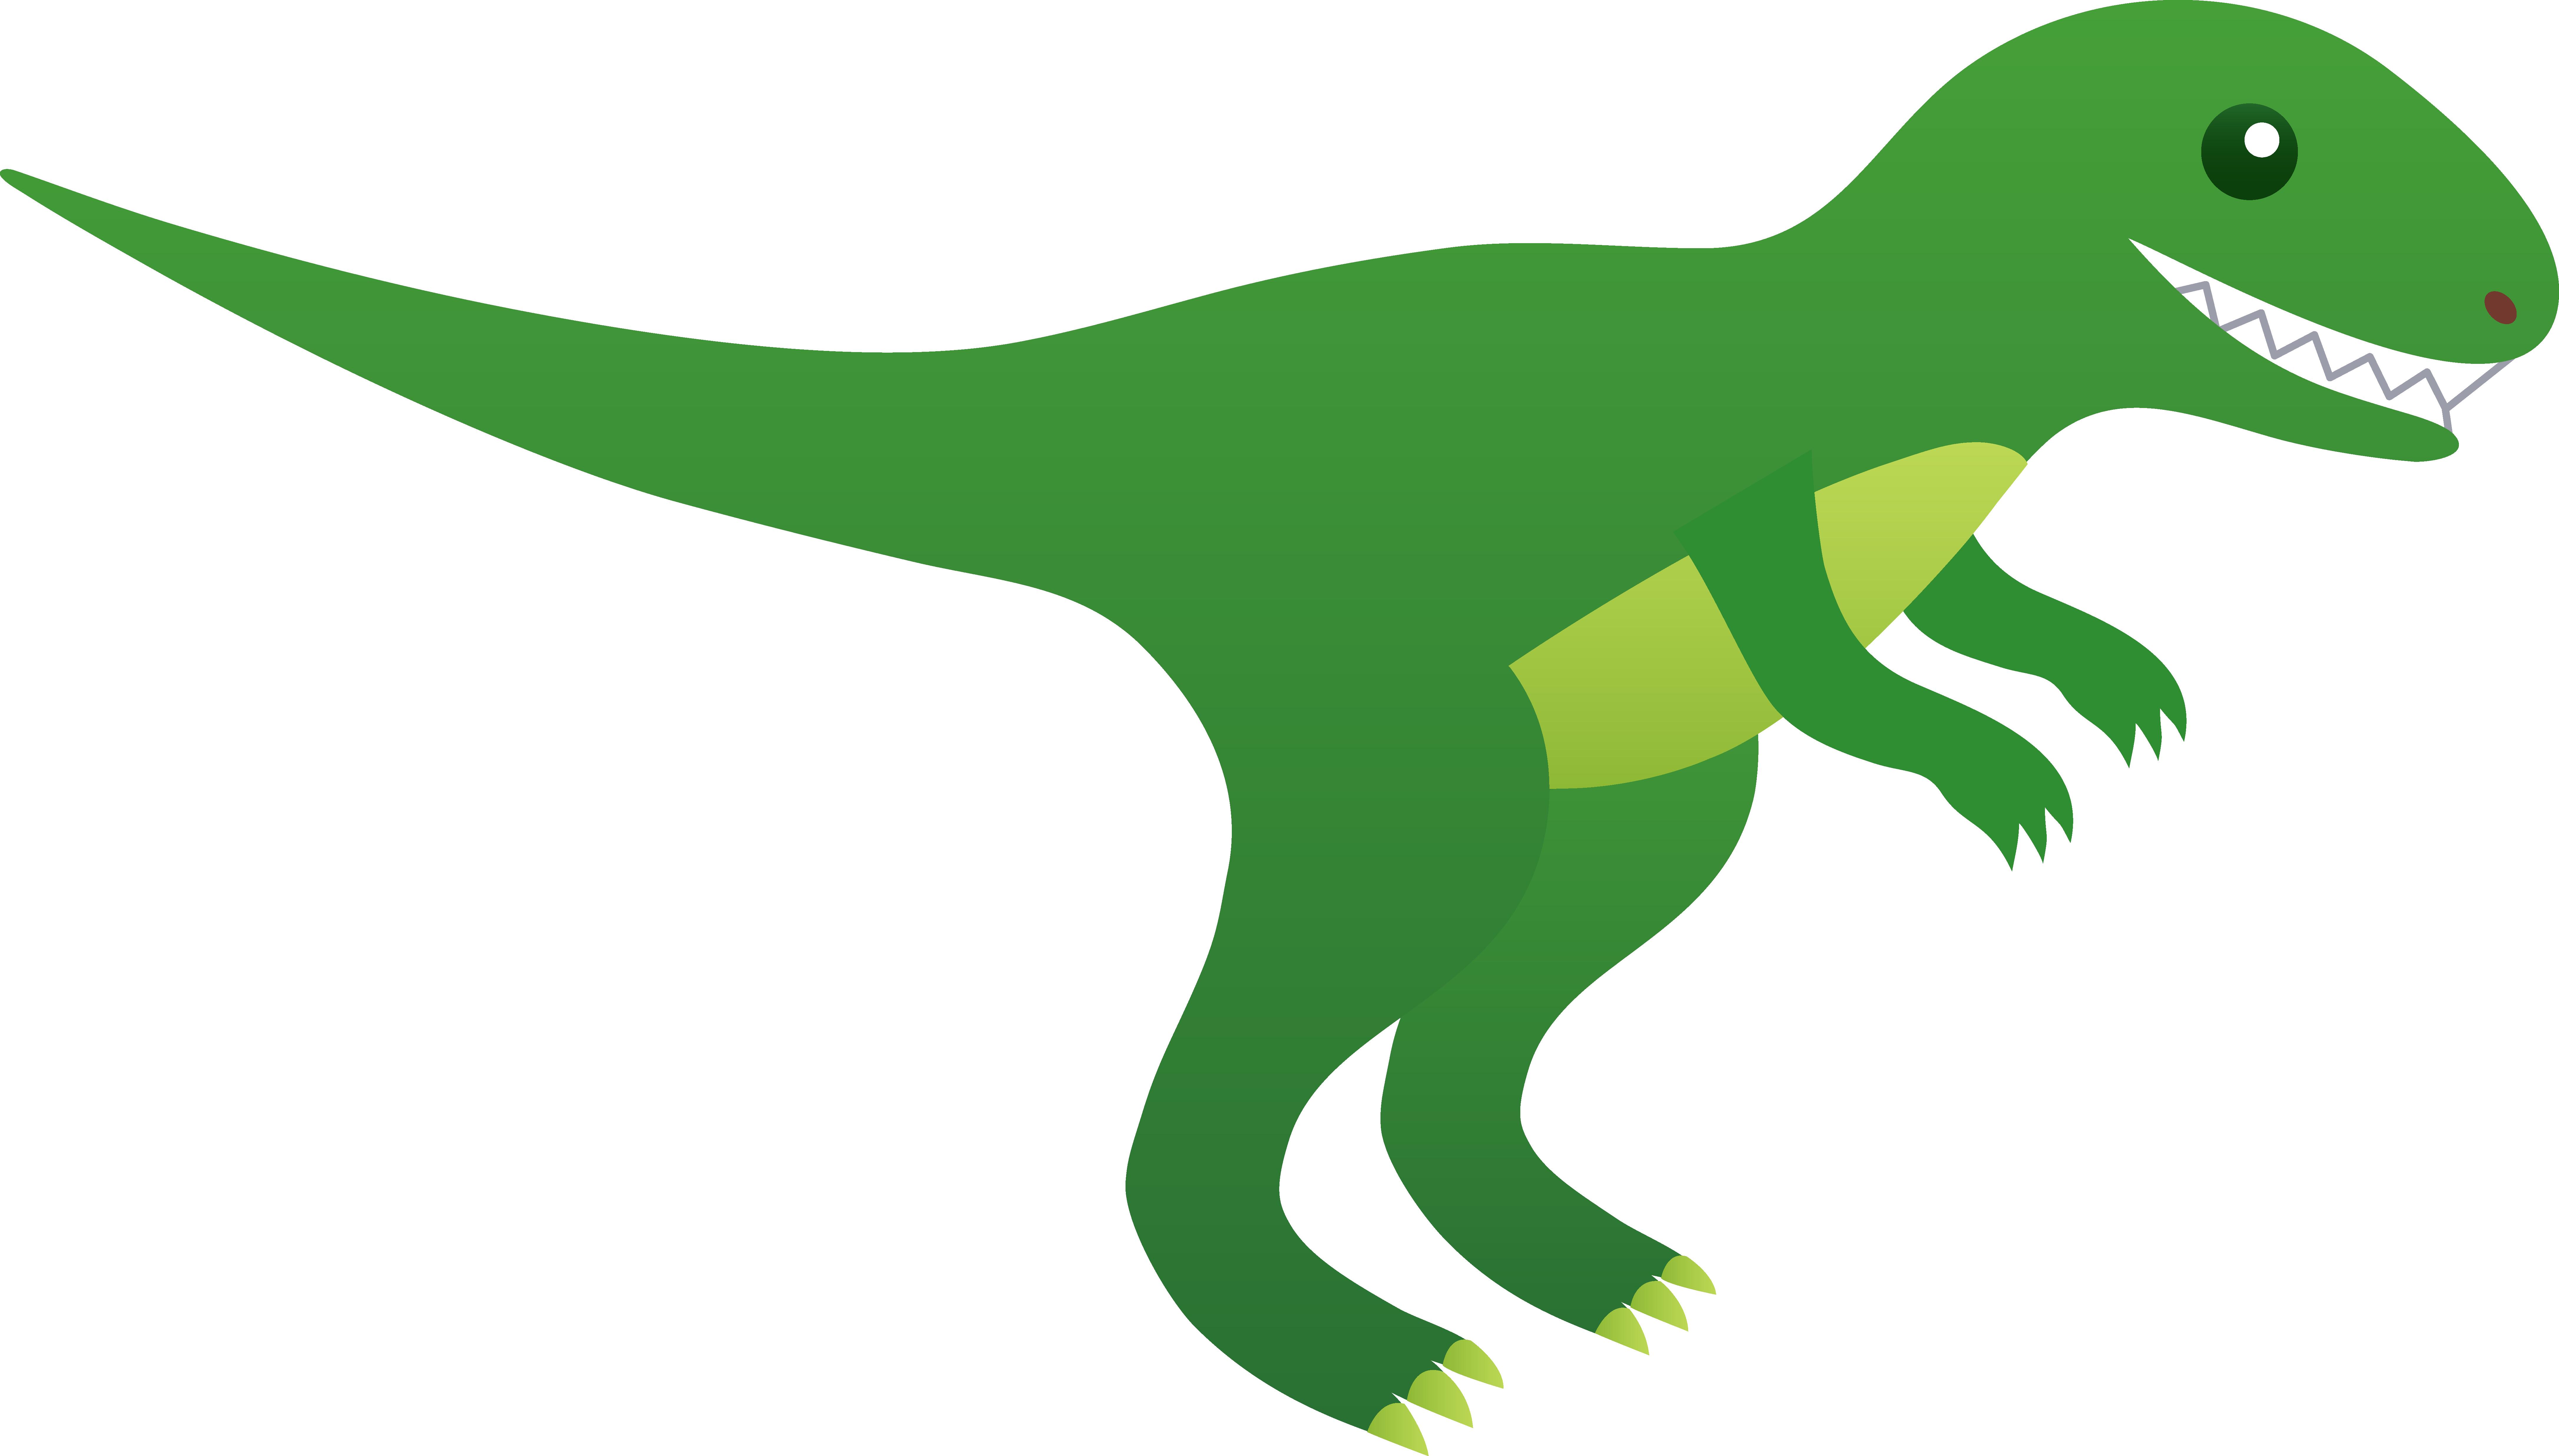 Free Cartoon Dinosaur Cliparts, Download Free Clip Art, Free.